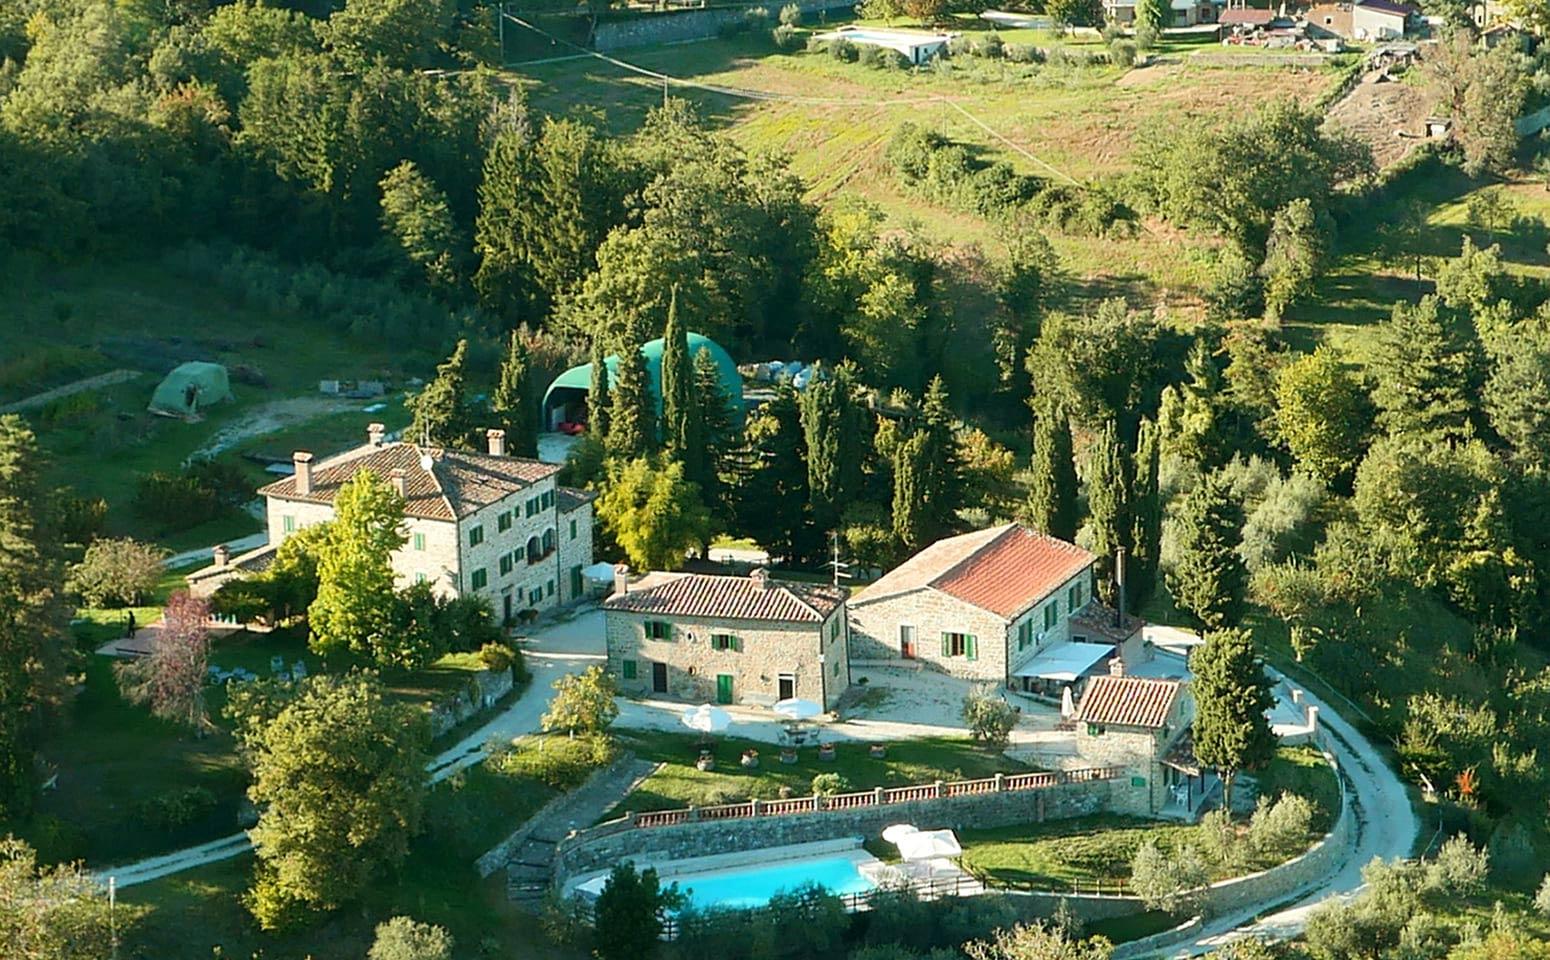 Agriturismo biologico in Valtiberina Toscana